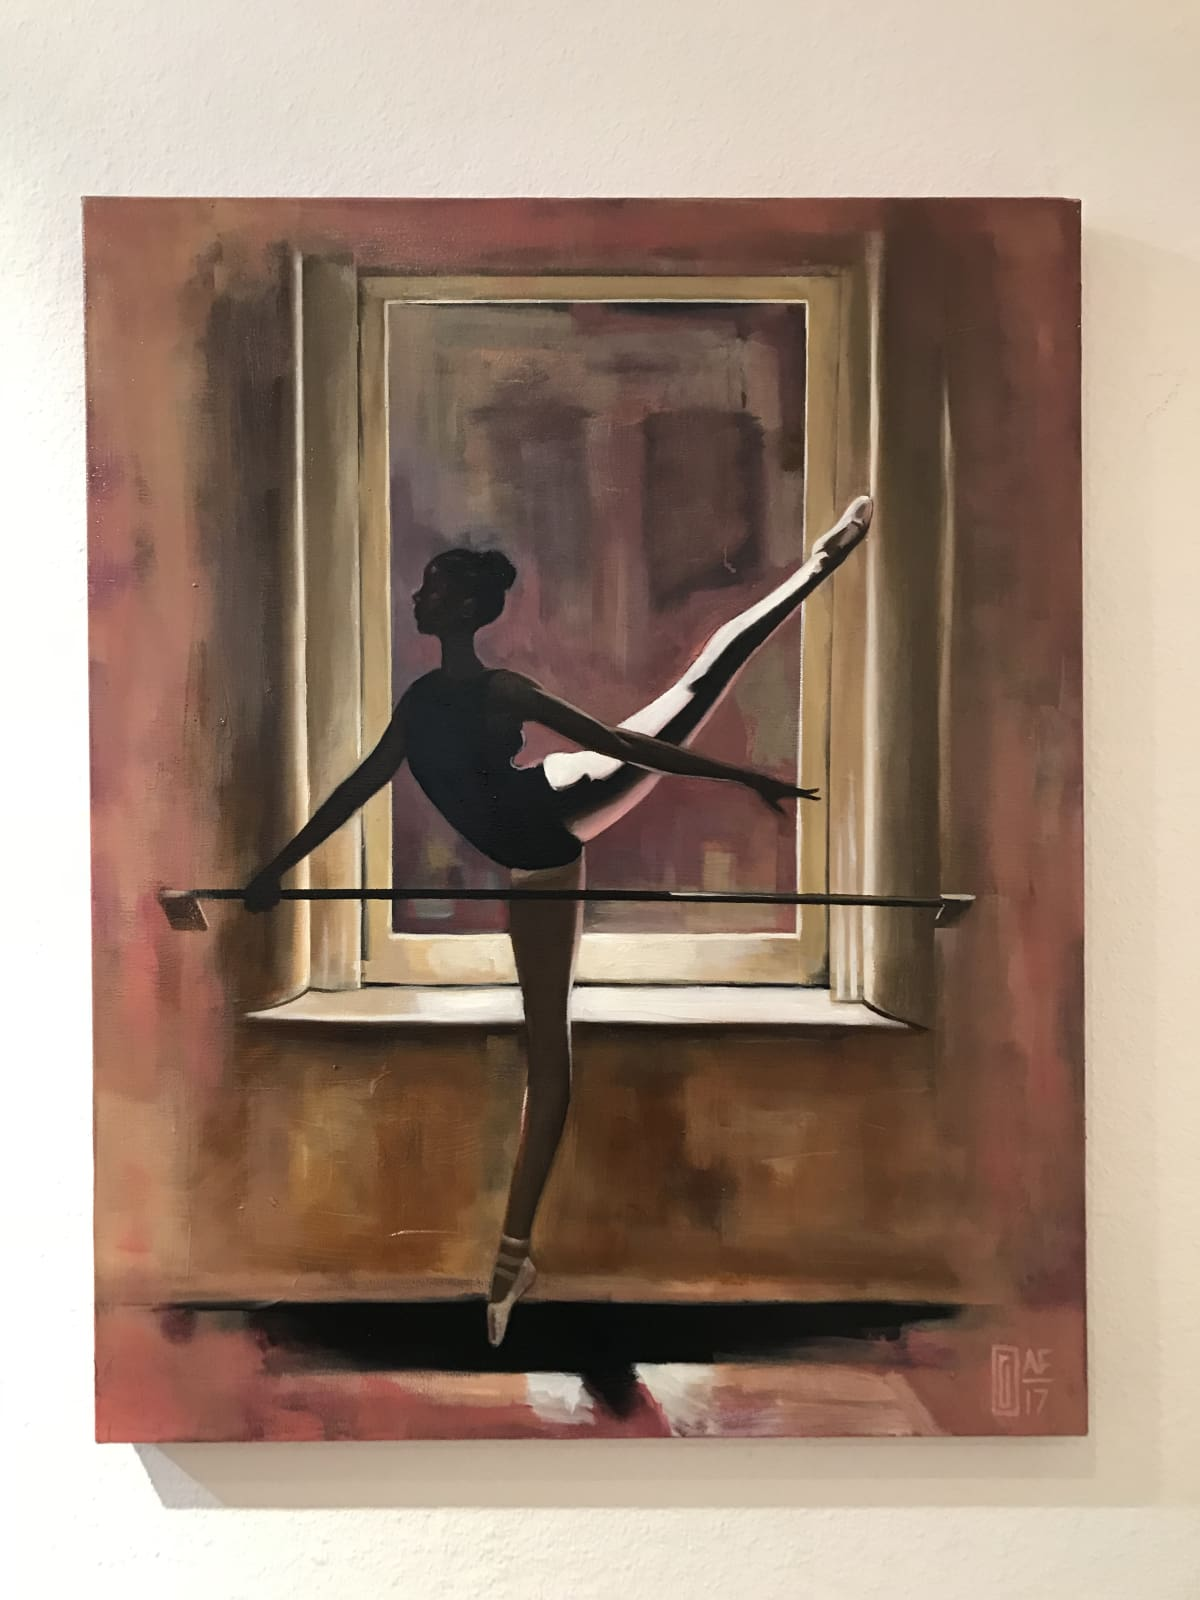 Curtis Gerhardt  Window Dressing  Oil on Canvas  24 x 36